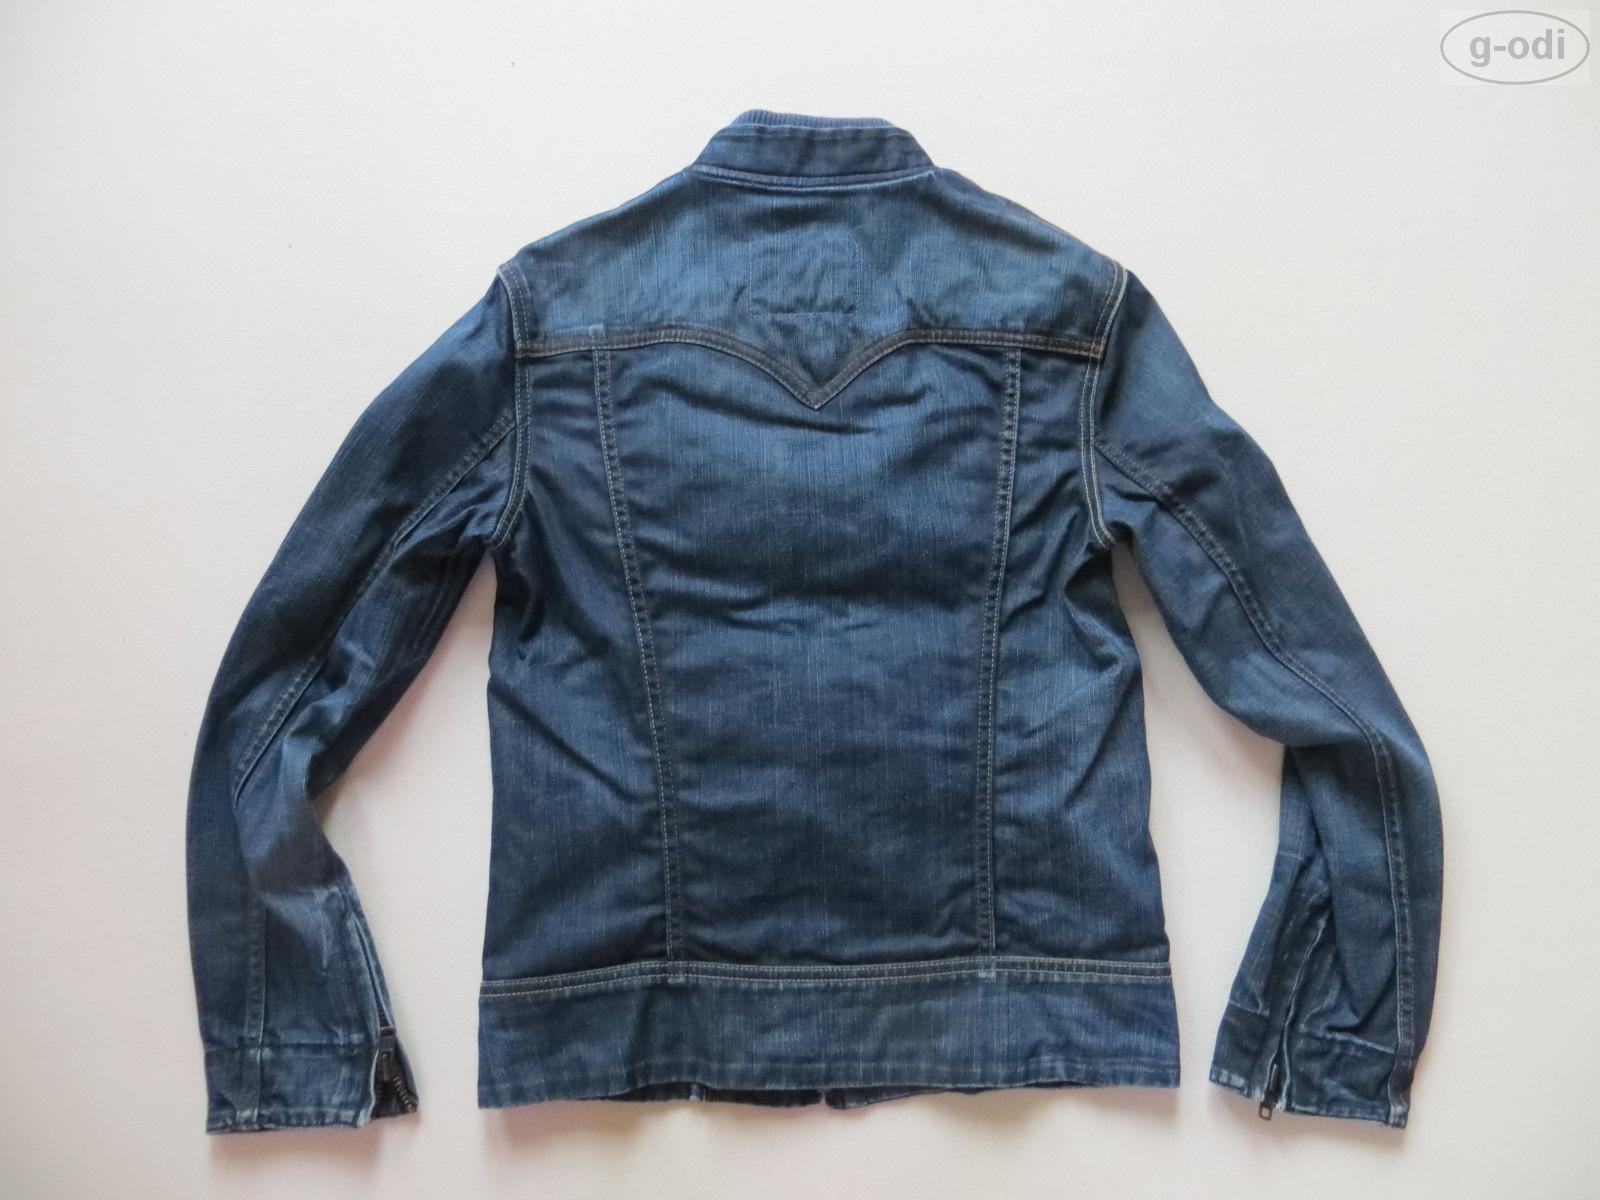 levi 39 s damen biker jacke jeansjacke gr s wie neu denim mit stehkragen ebay. Black Bedroom Furniture Sets. Home Design Ideas